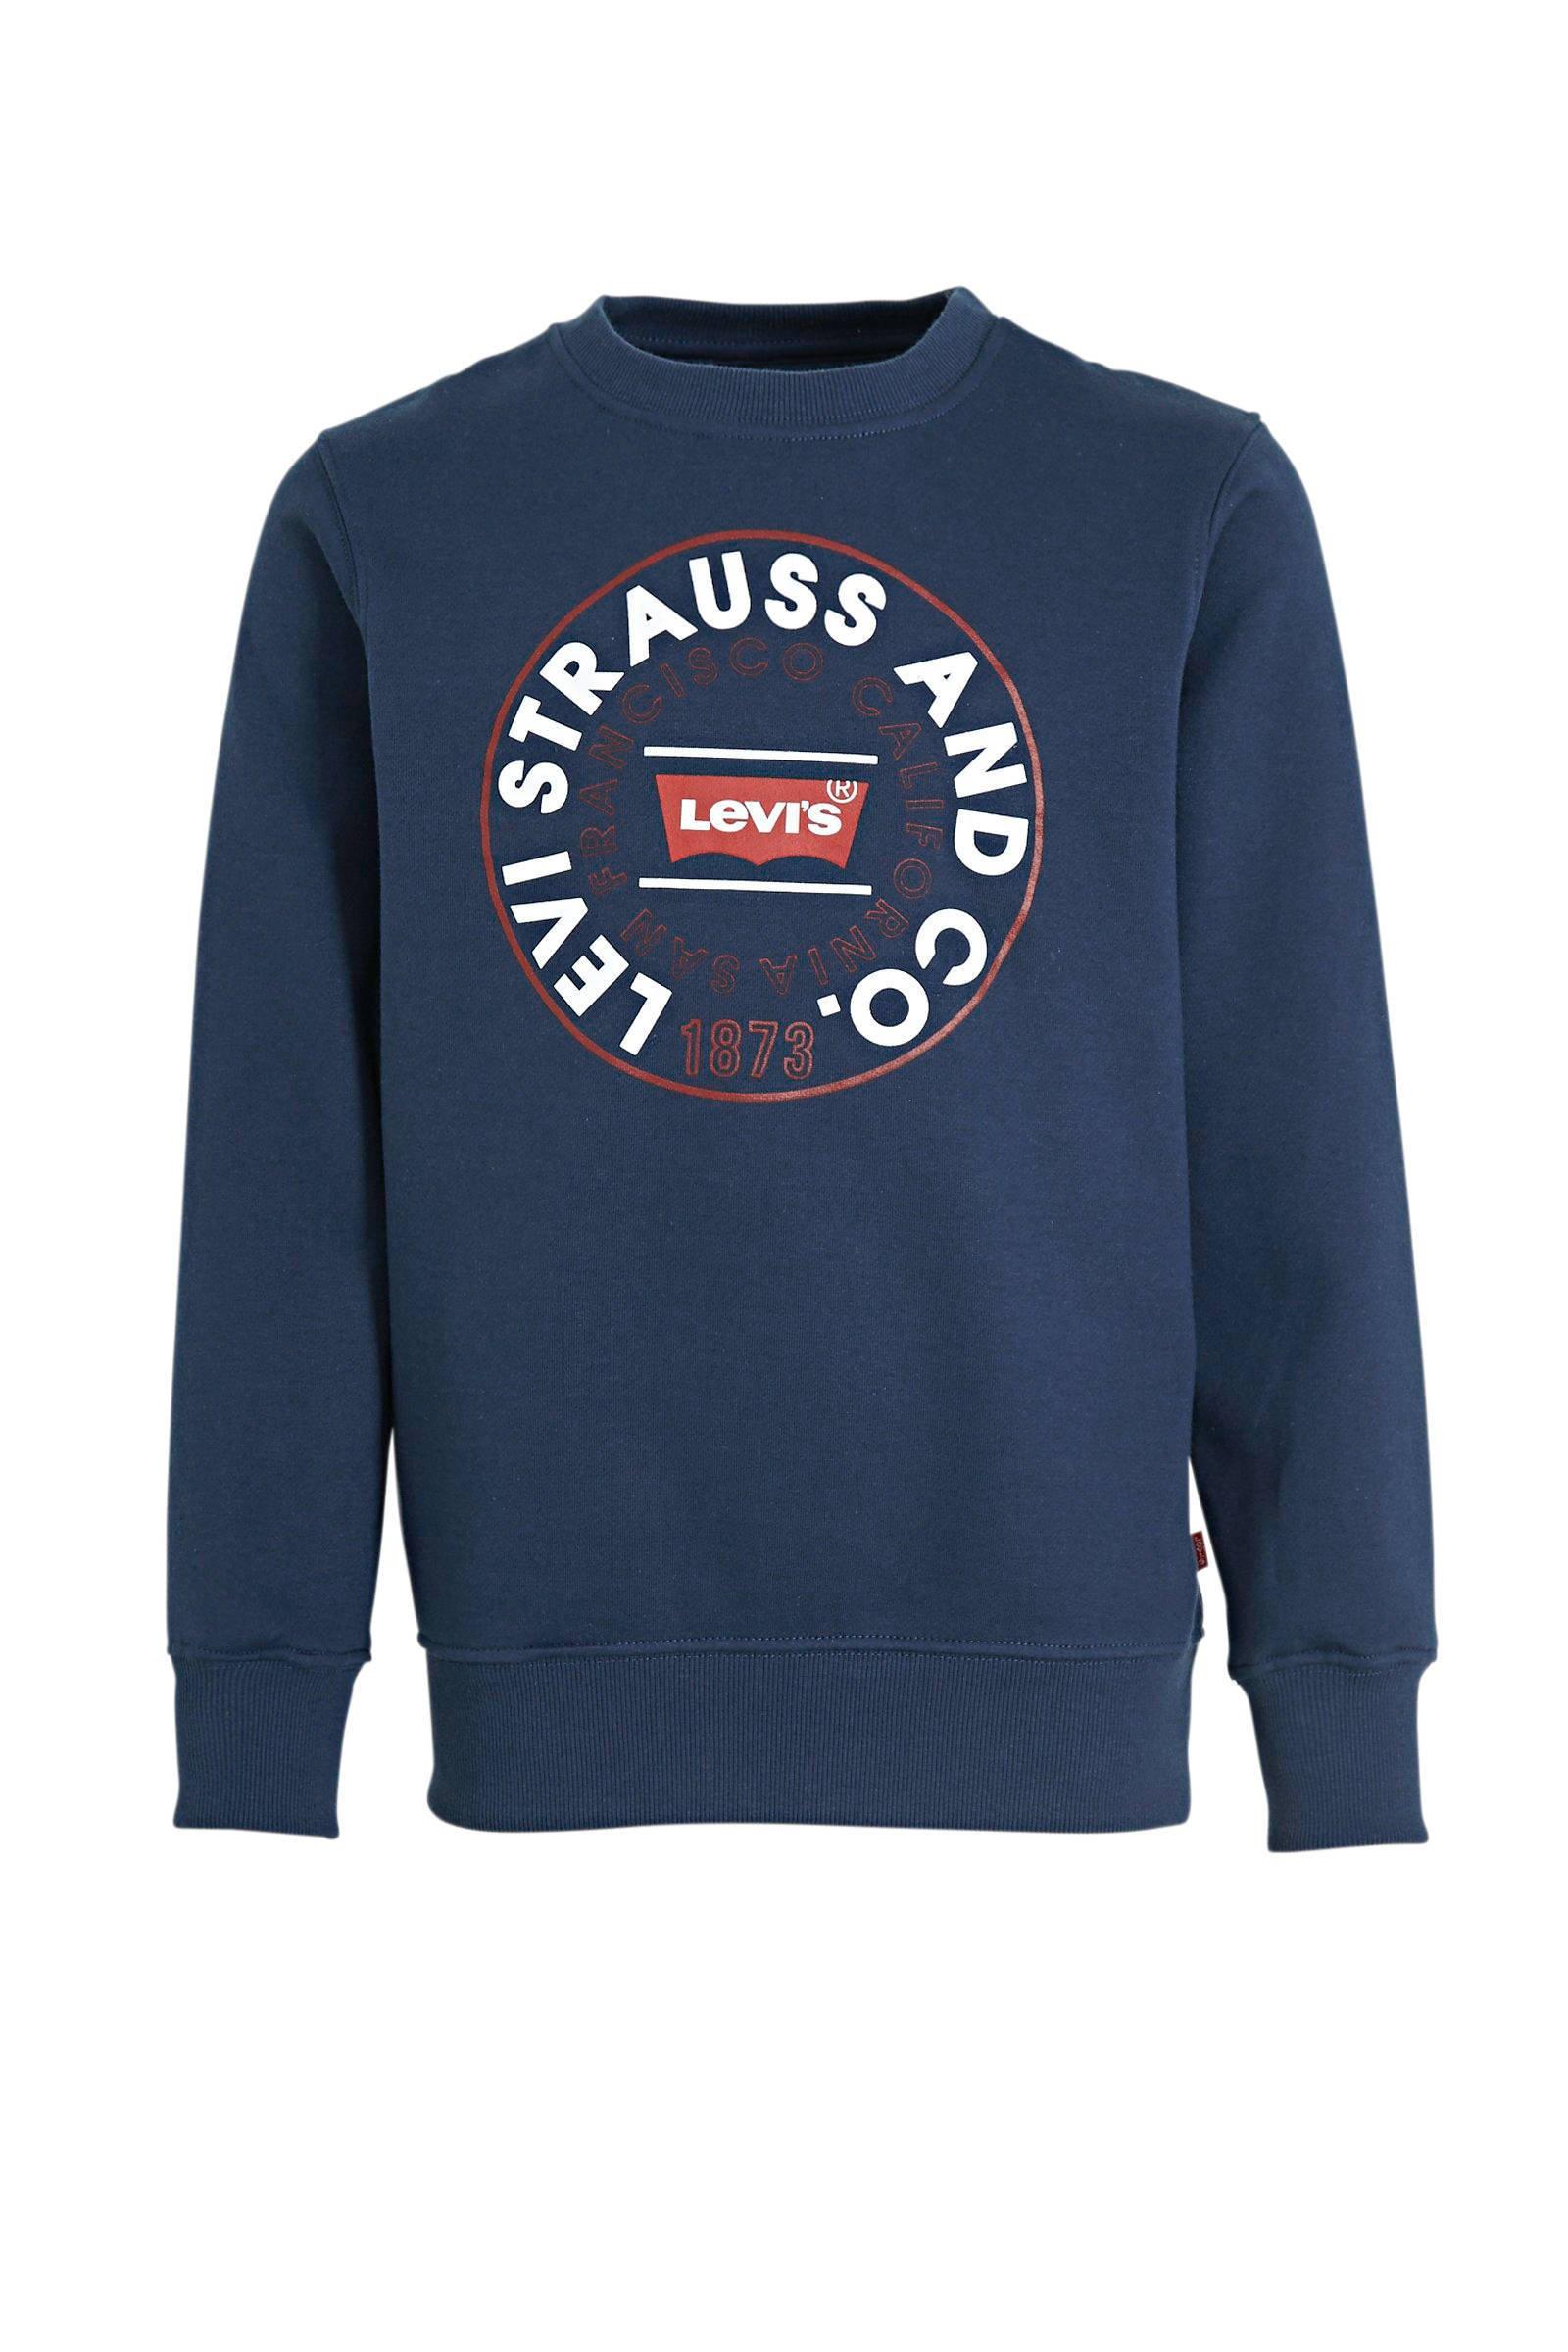 Levi's kids Levi's Kids sweater met logo donkerblauw   wehkamp